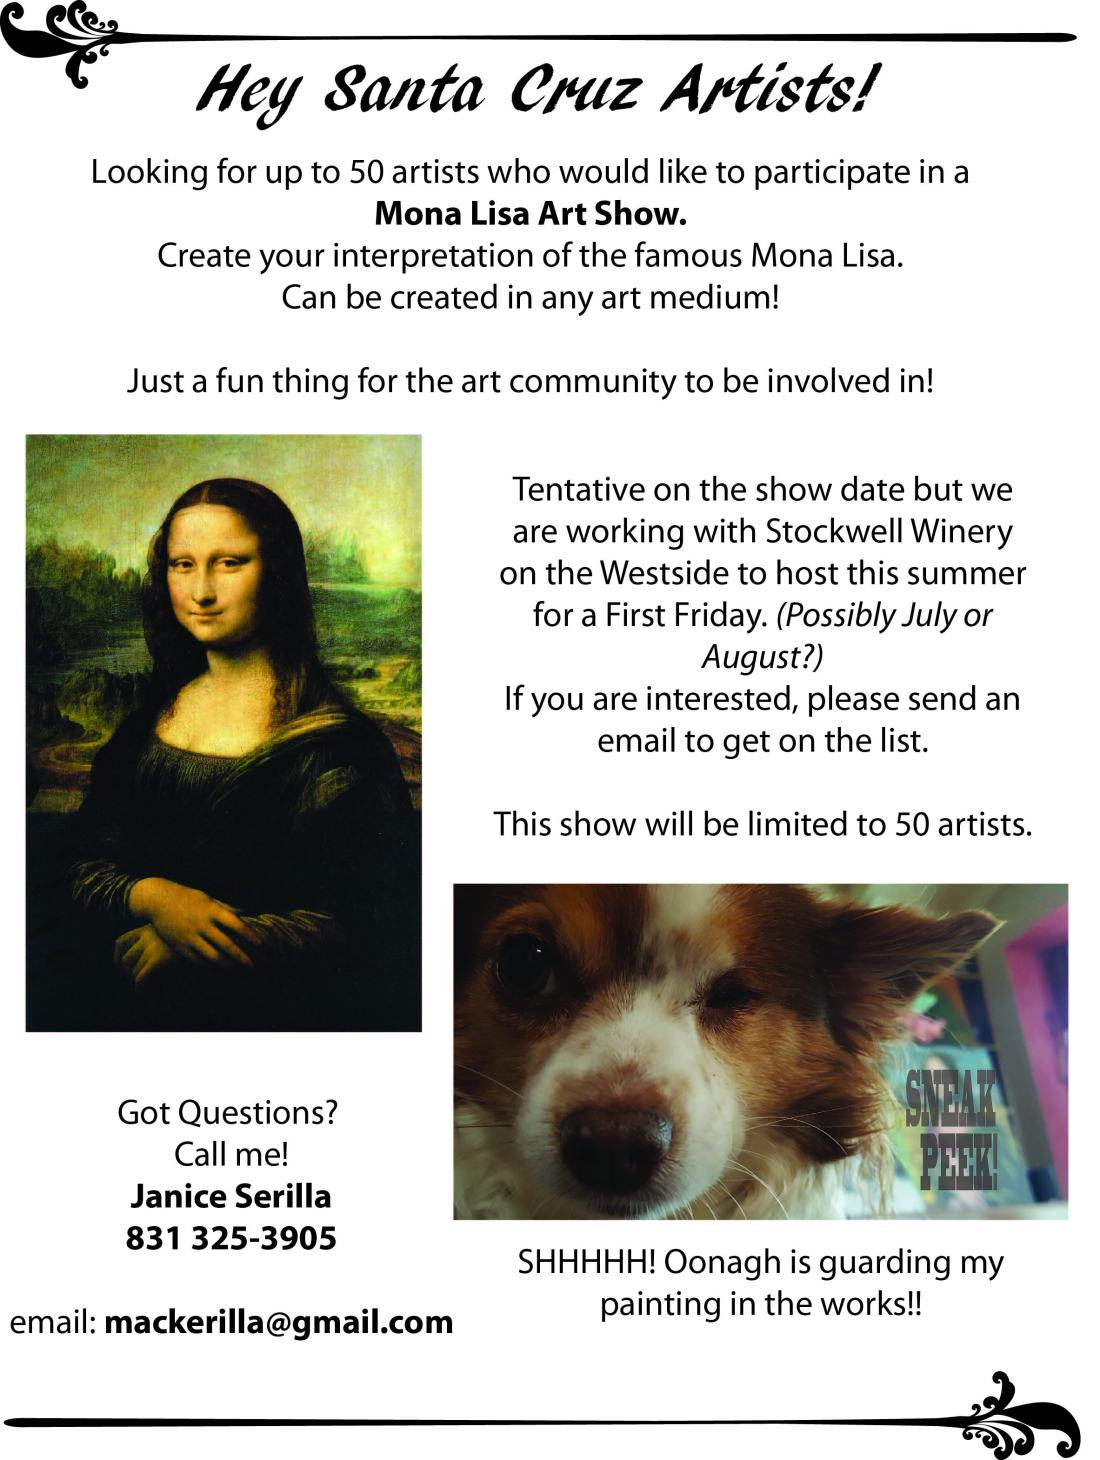 Mona lisa art show flyer